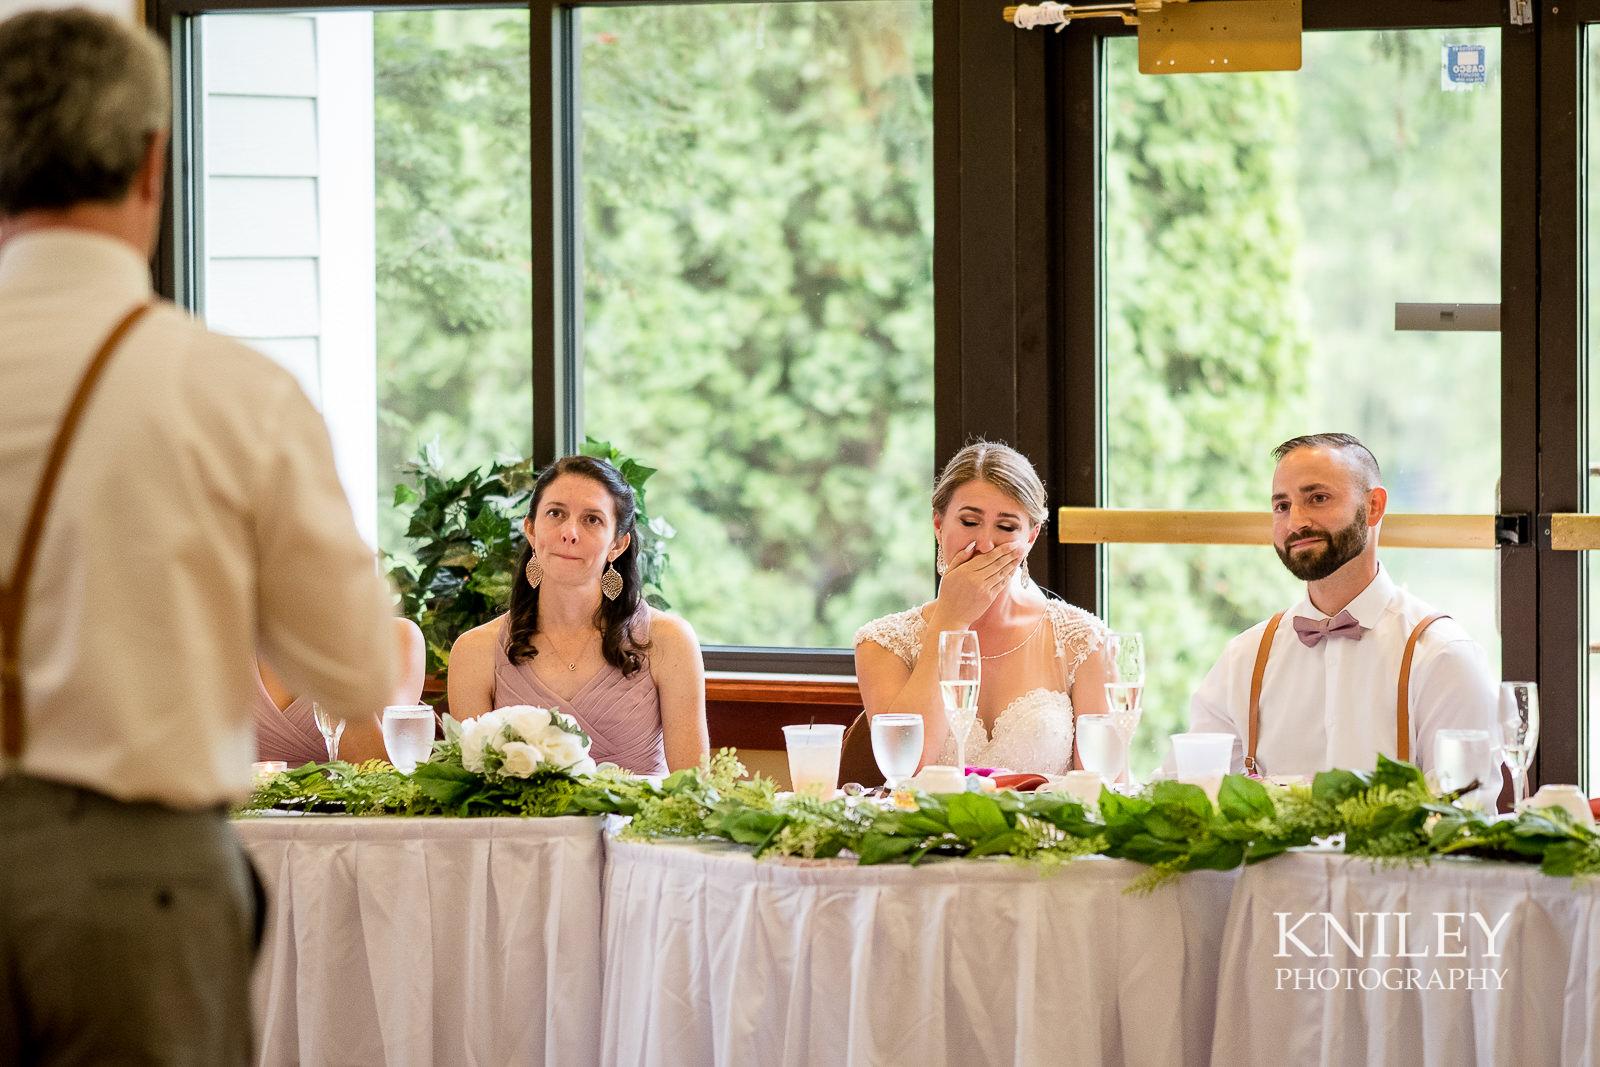 085 - Ontario Golf Club Wedding Pictures - XT2B8950.jpgOntario Golf Club wedding picture - Dad sharing about daughter.jpg